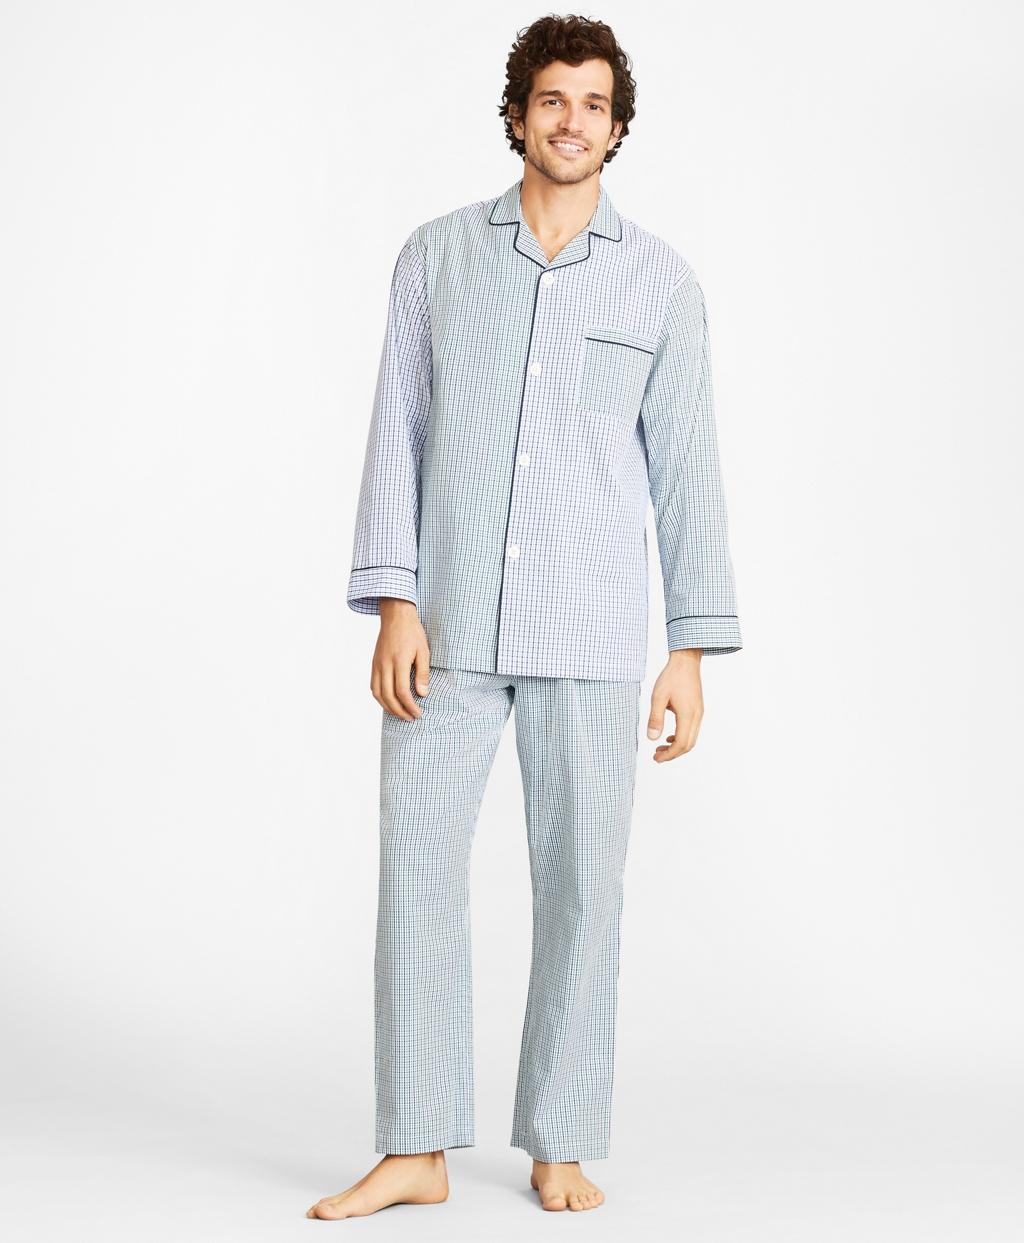 Vintage Men's Underwear Brooks Brothers Mens Seersucker Fun Plaid Pajamas $98.50 AT vintagedancer.com